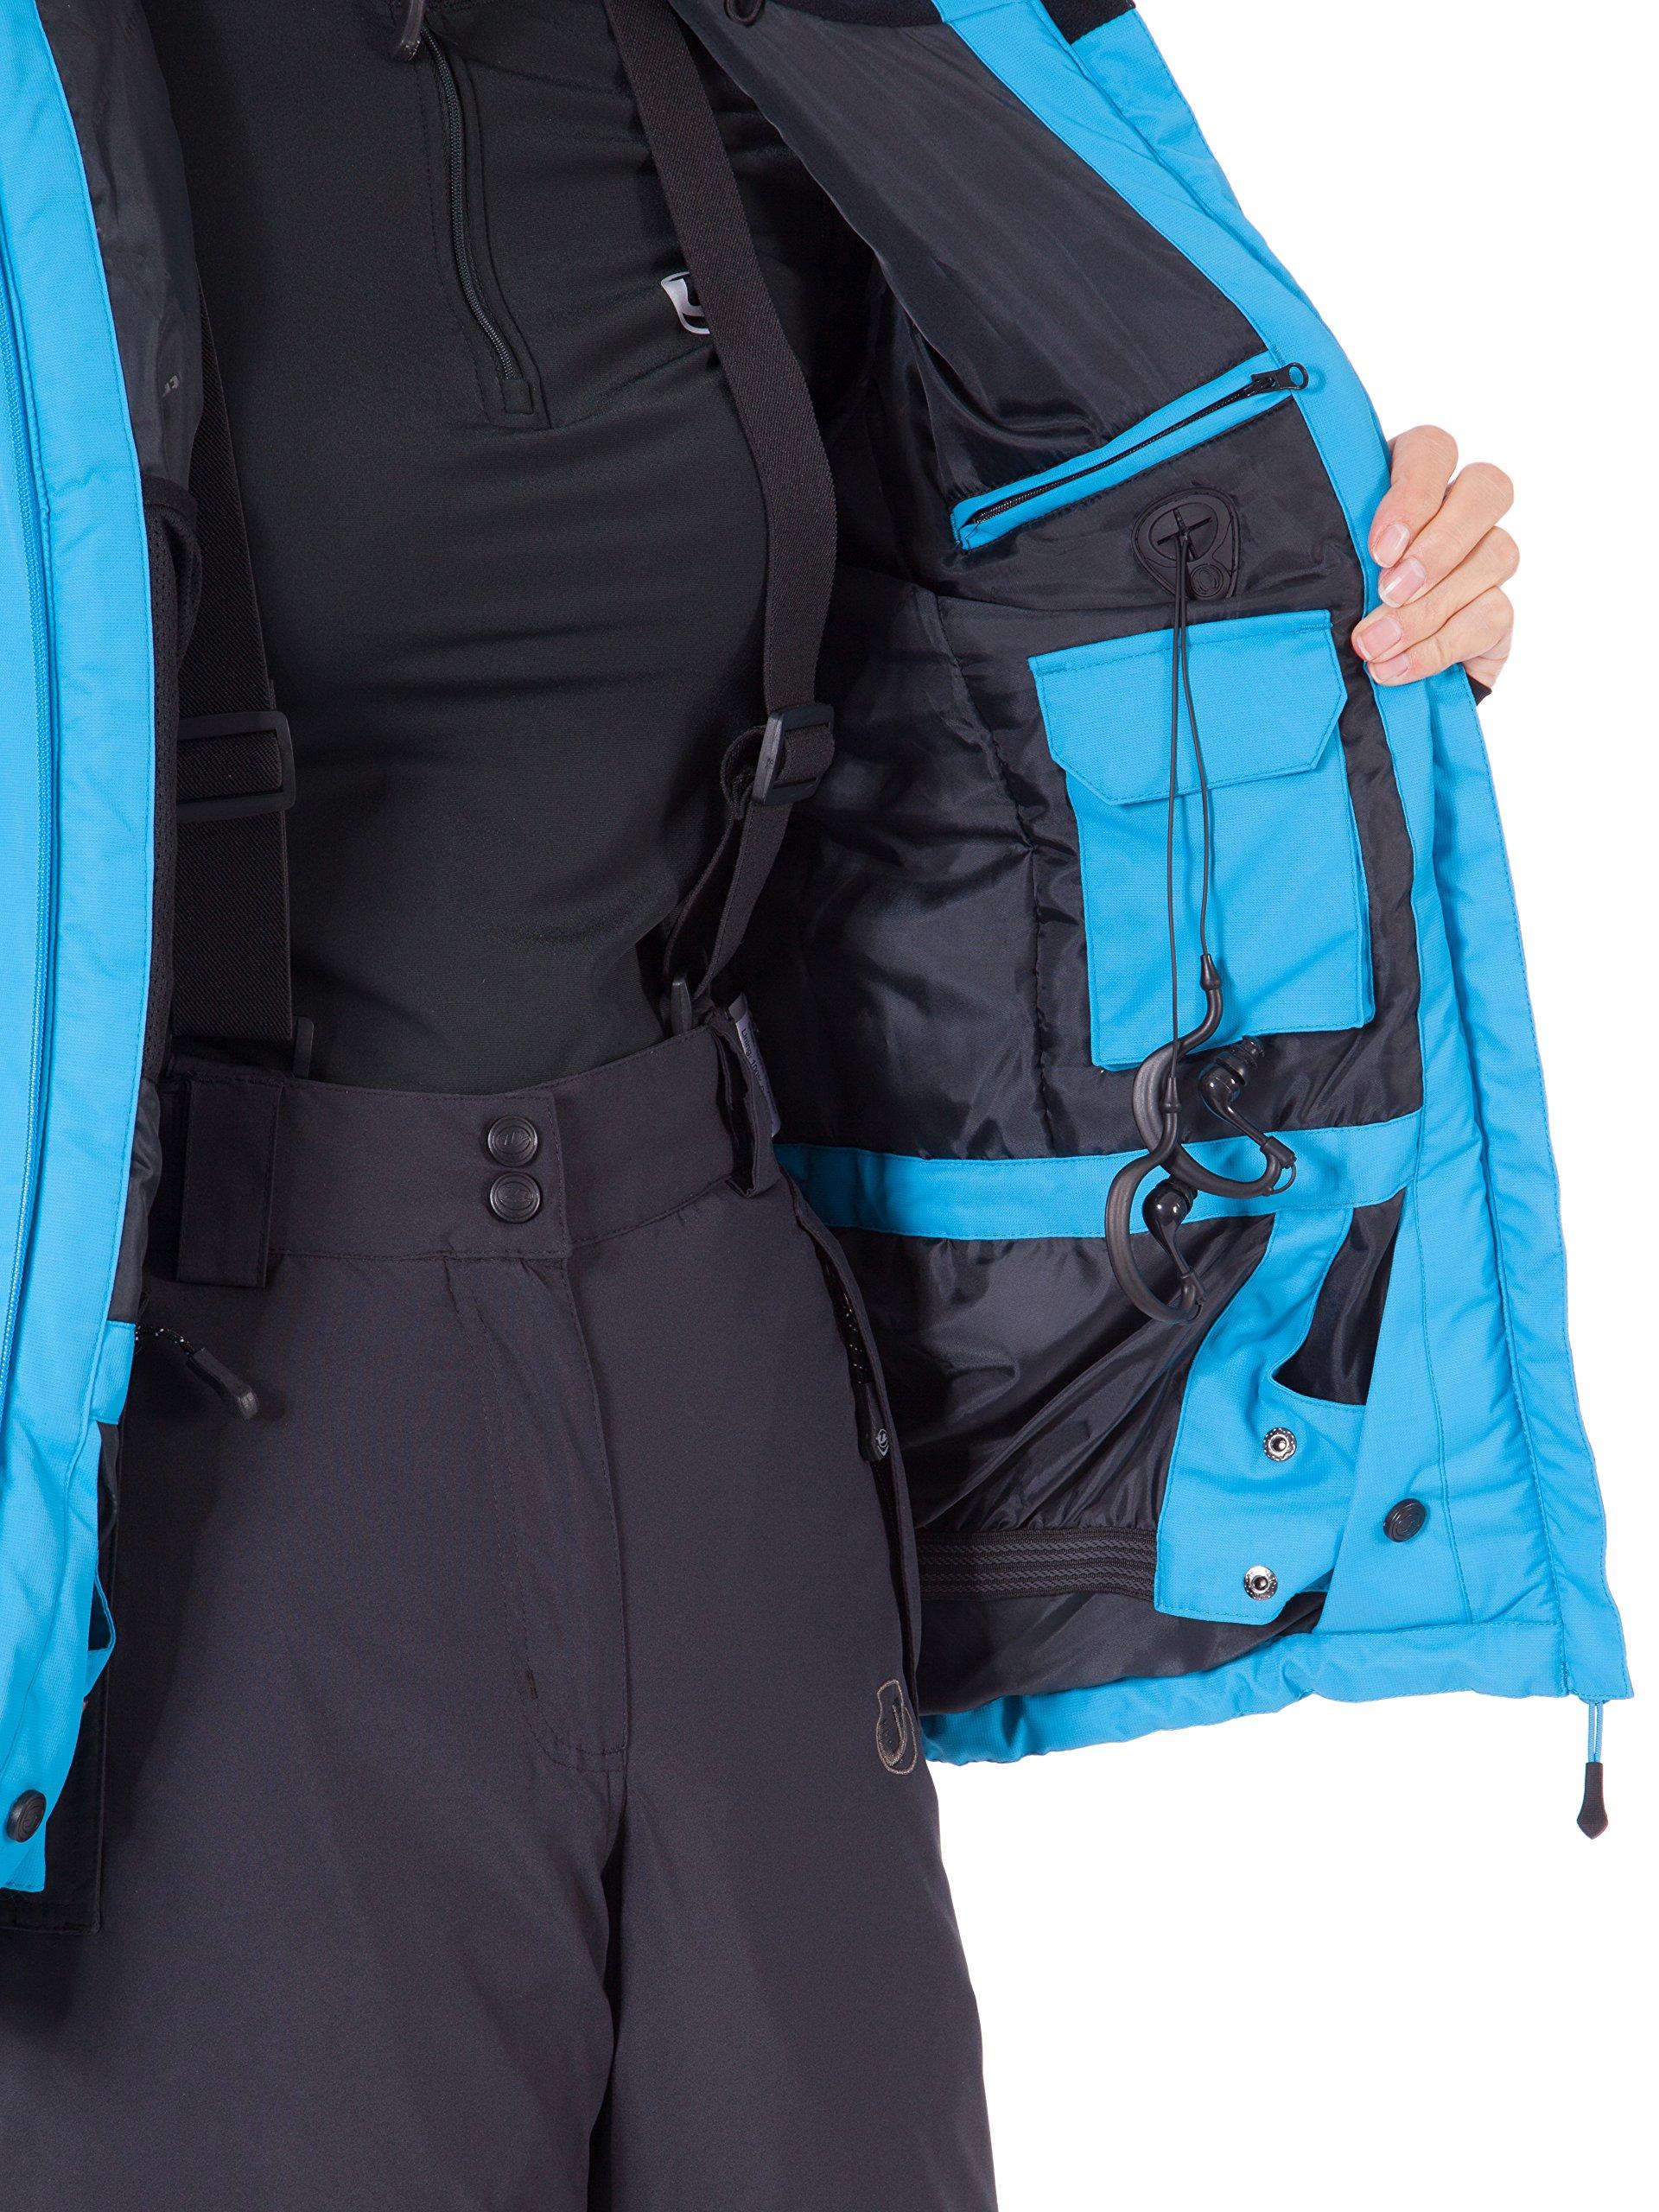 Ultrasport Advanced Damen Skijacke Mayrhofen, Outdoor Jacke